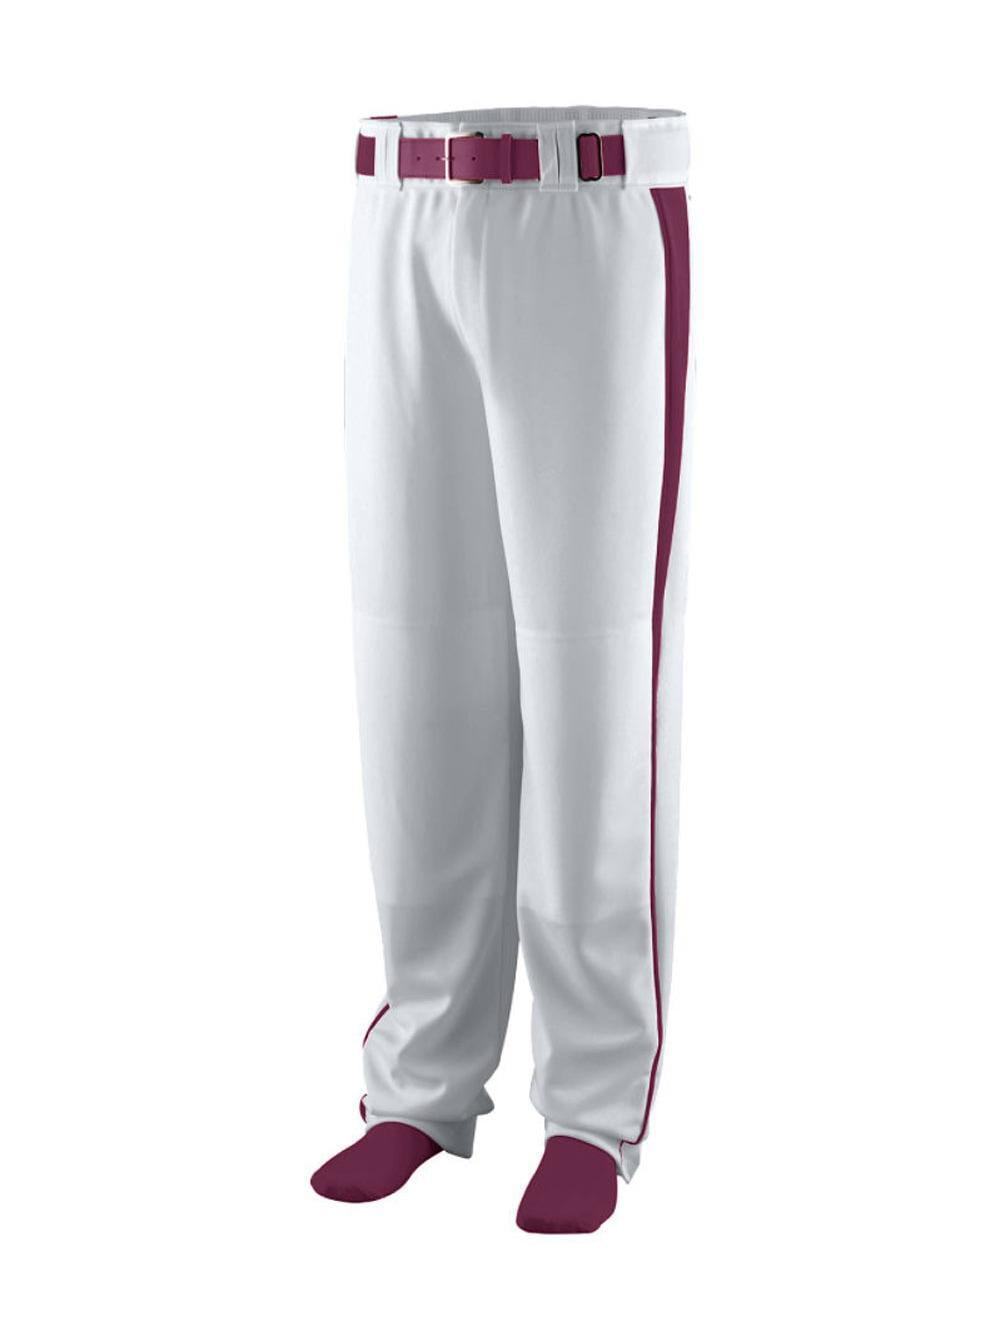 Augusta Sportswear Athletics Youth Triple Play Baseball/Softball Pant